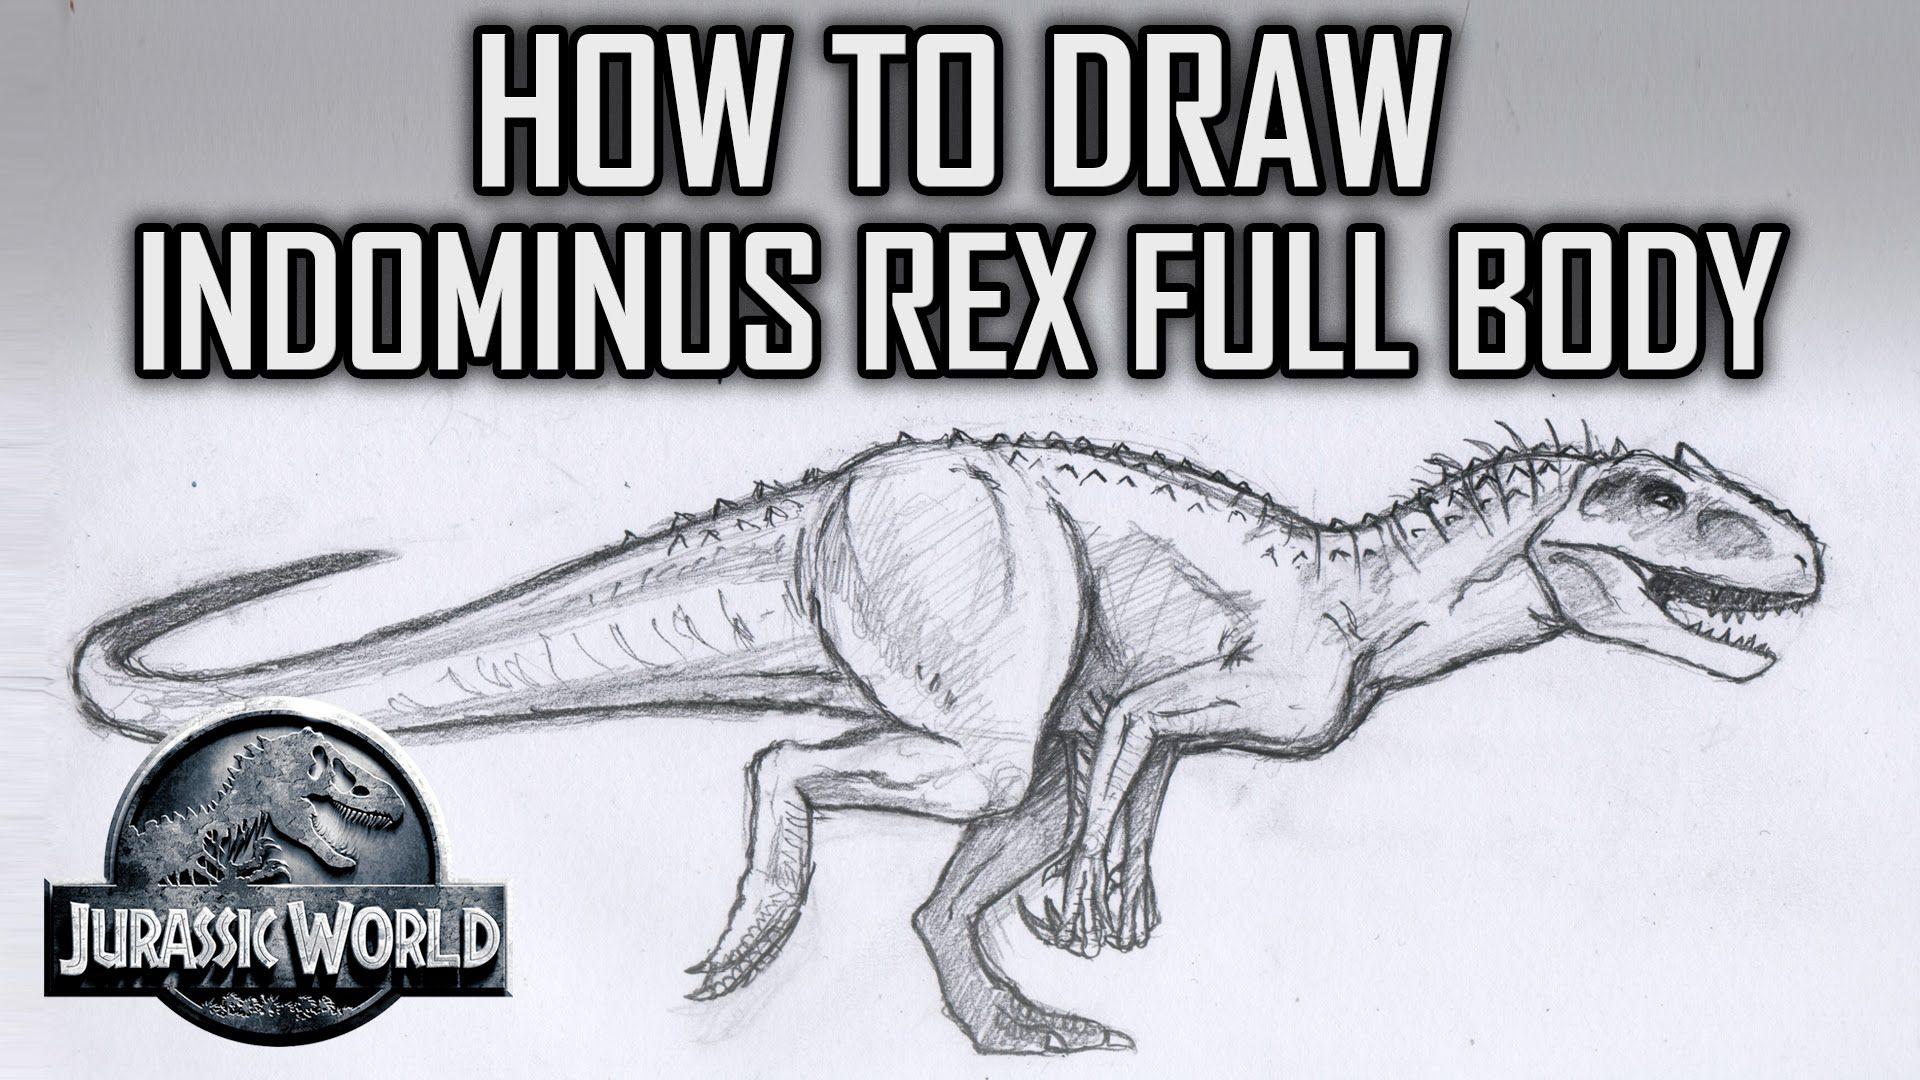 How To Draw Indominus Rex Full Body Jurassic World Tutorial Tuesday Pt1 Indominus Rex Jurassic World Jurassic World Indominus Rex